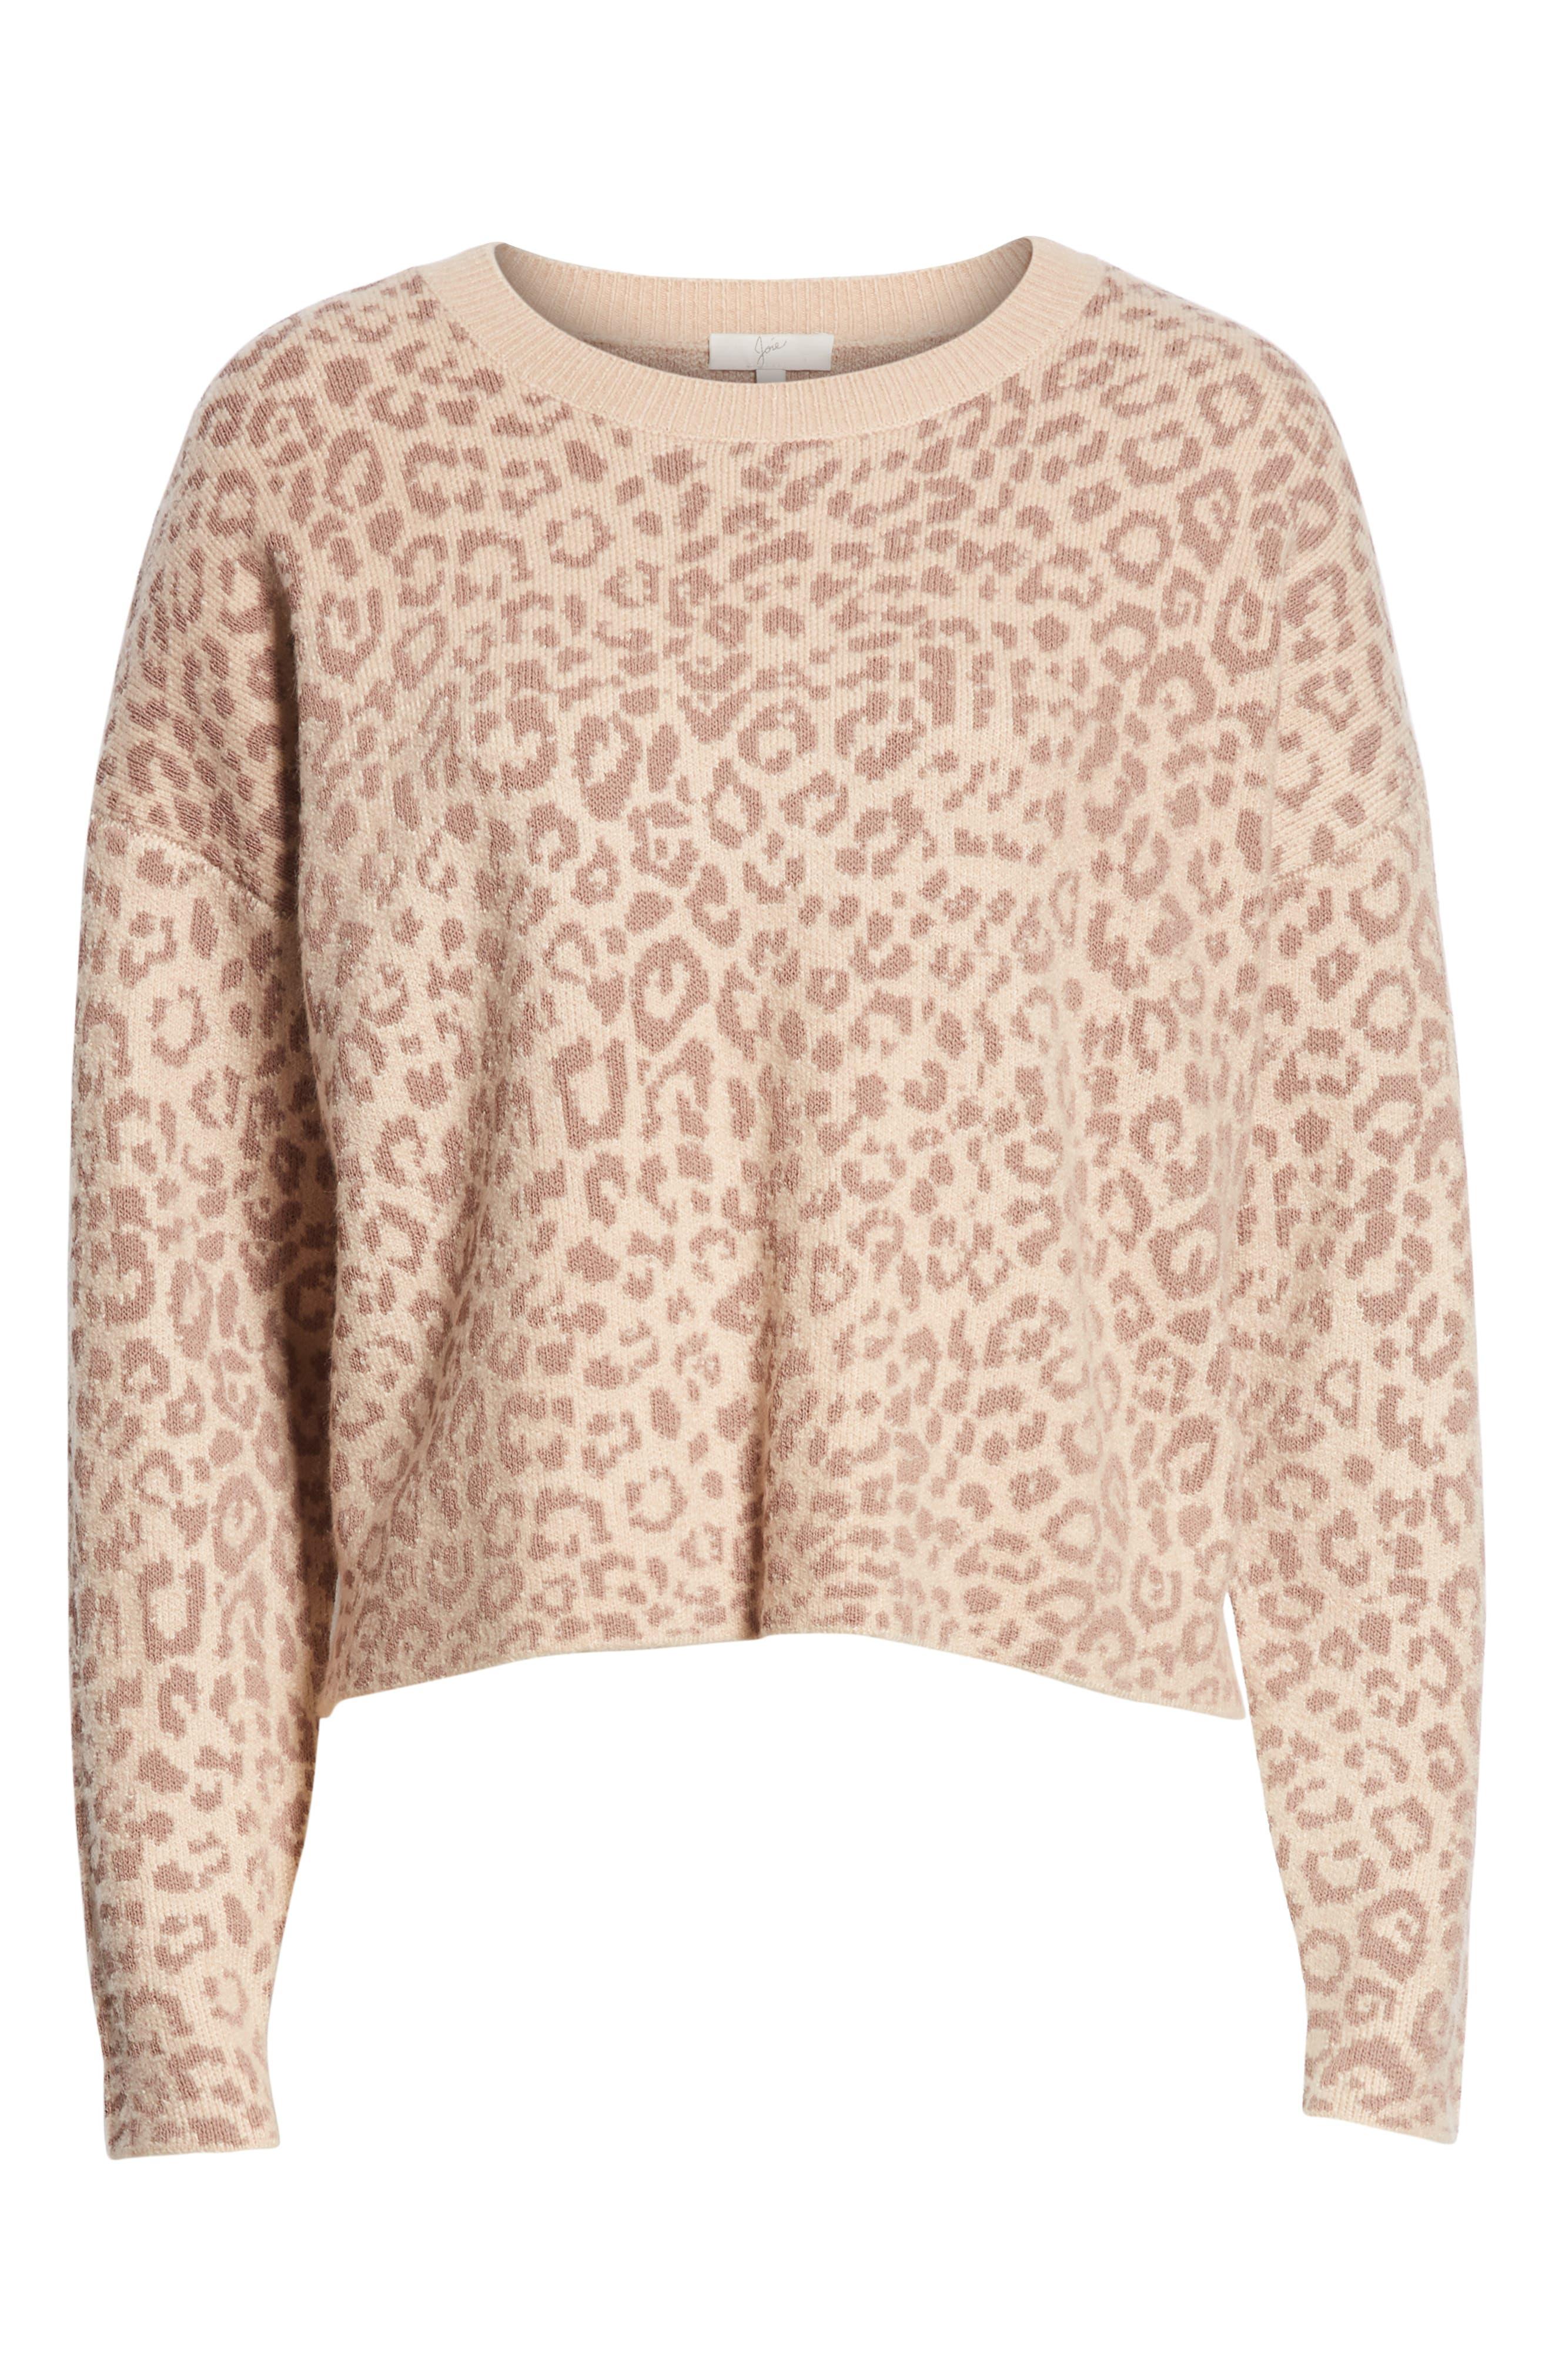 Leopard Print Sweater,                             Alternate thumbnail 6, color,                             250